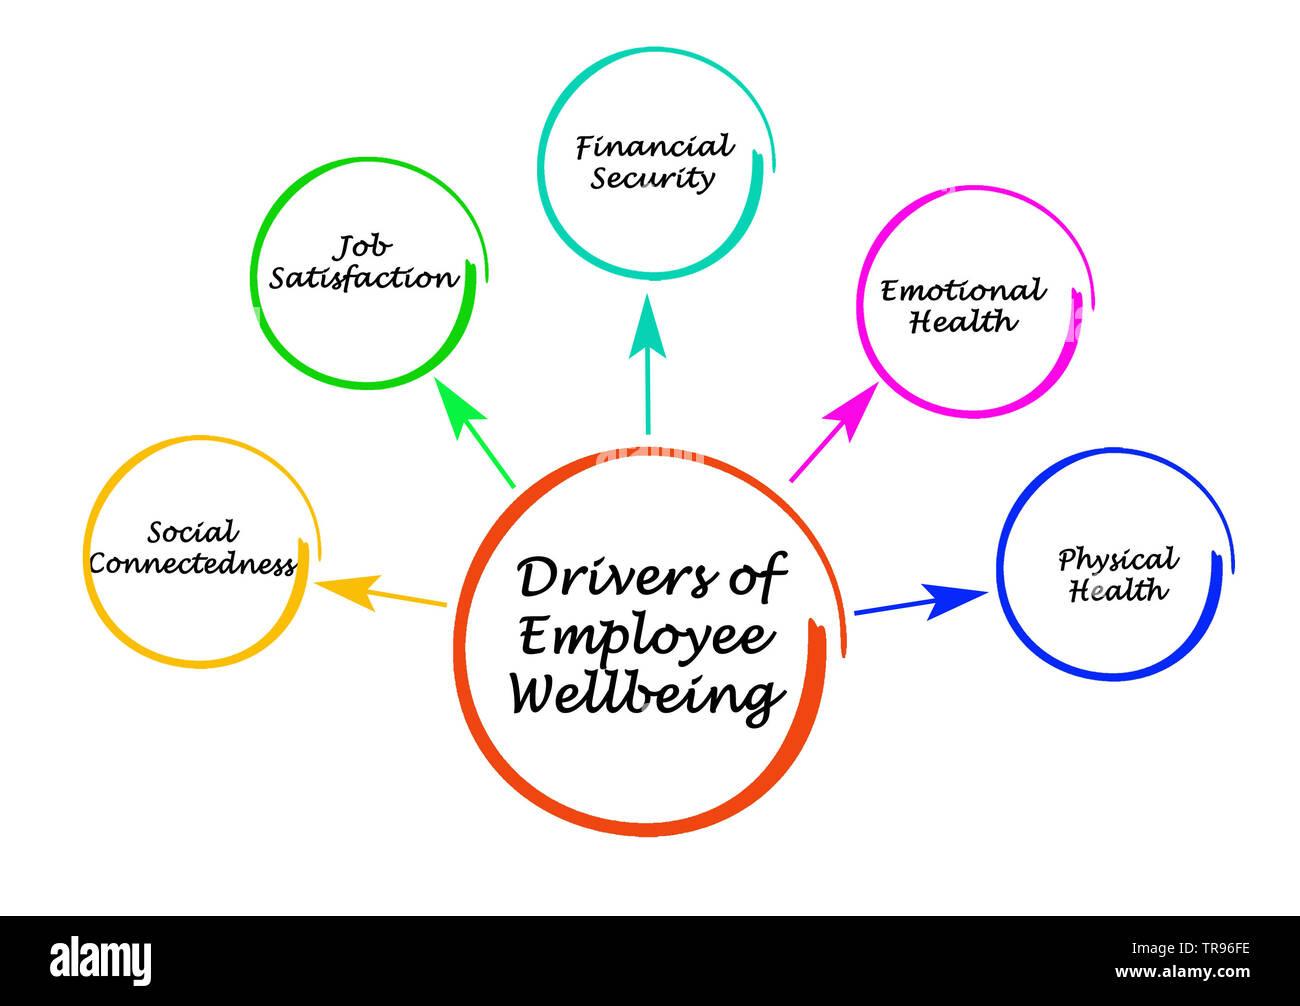 Drivers of Employee Wellbeing - Stock Image